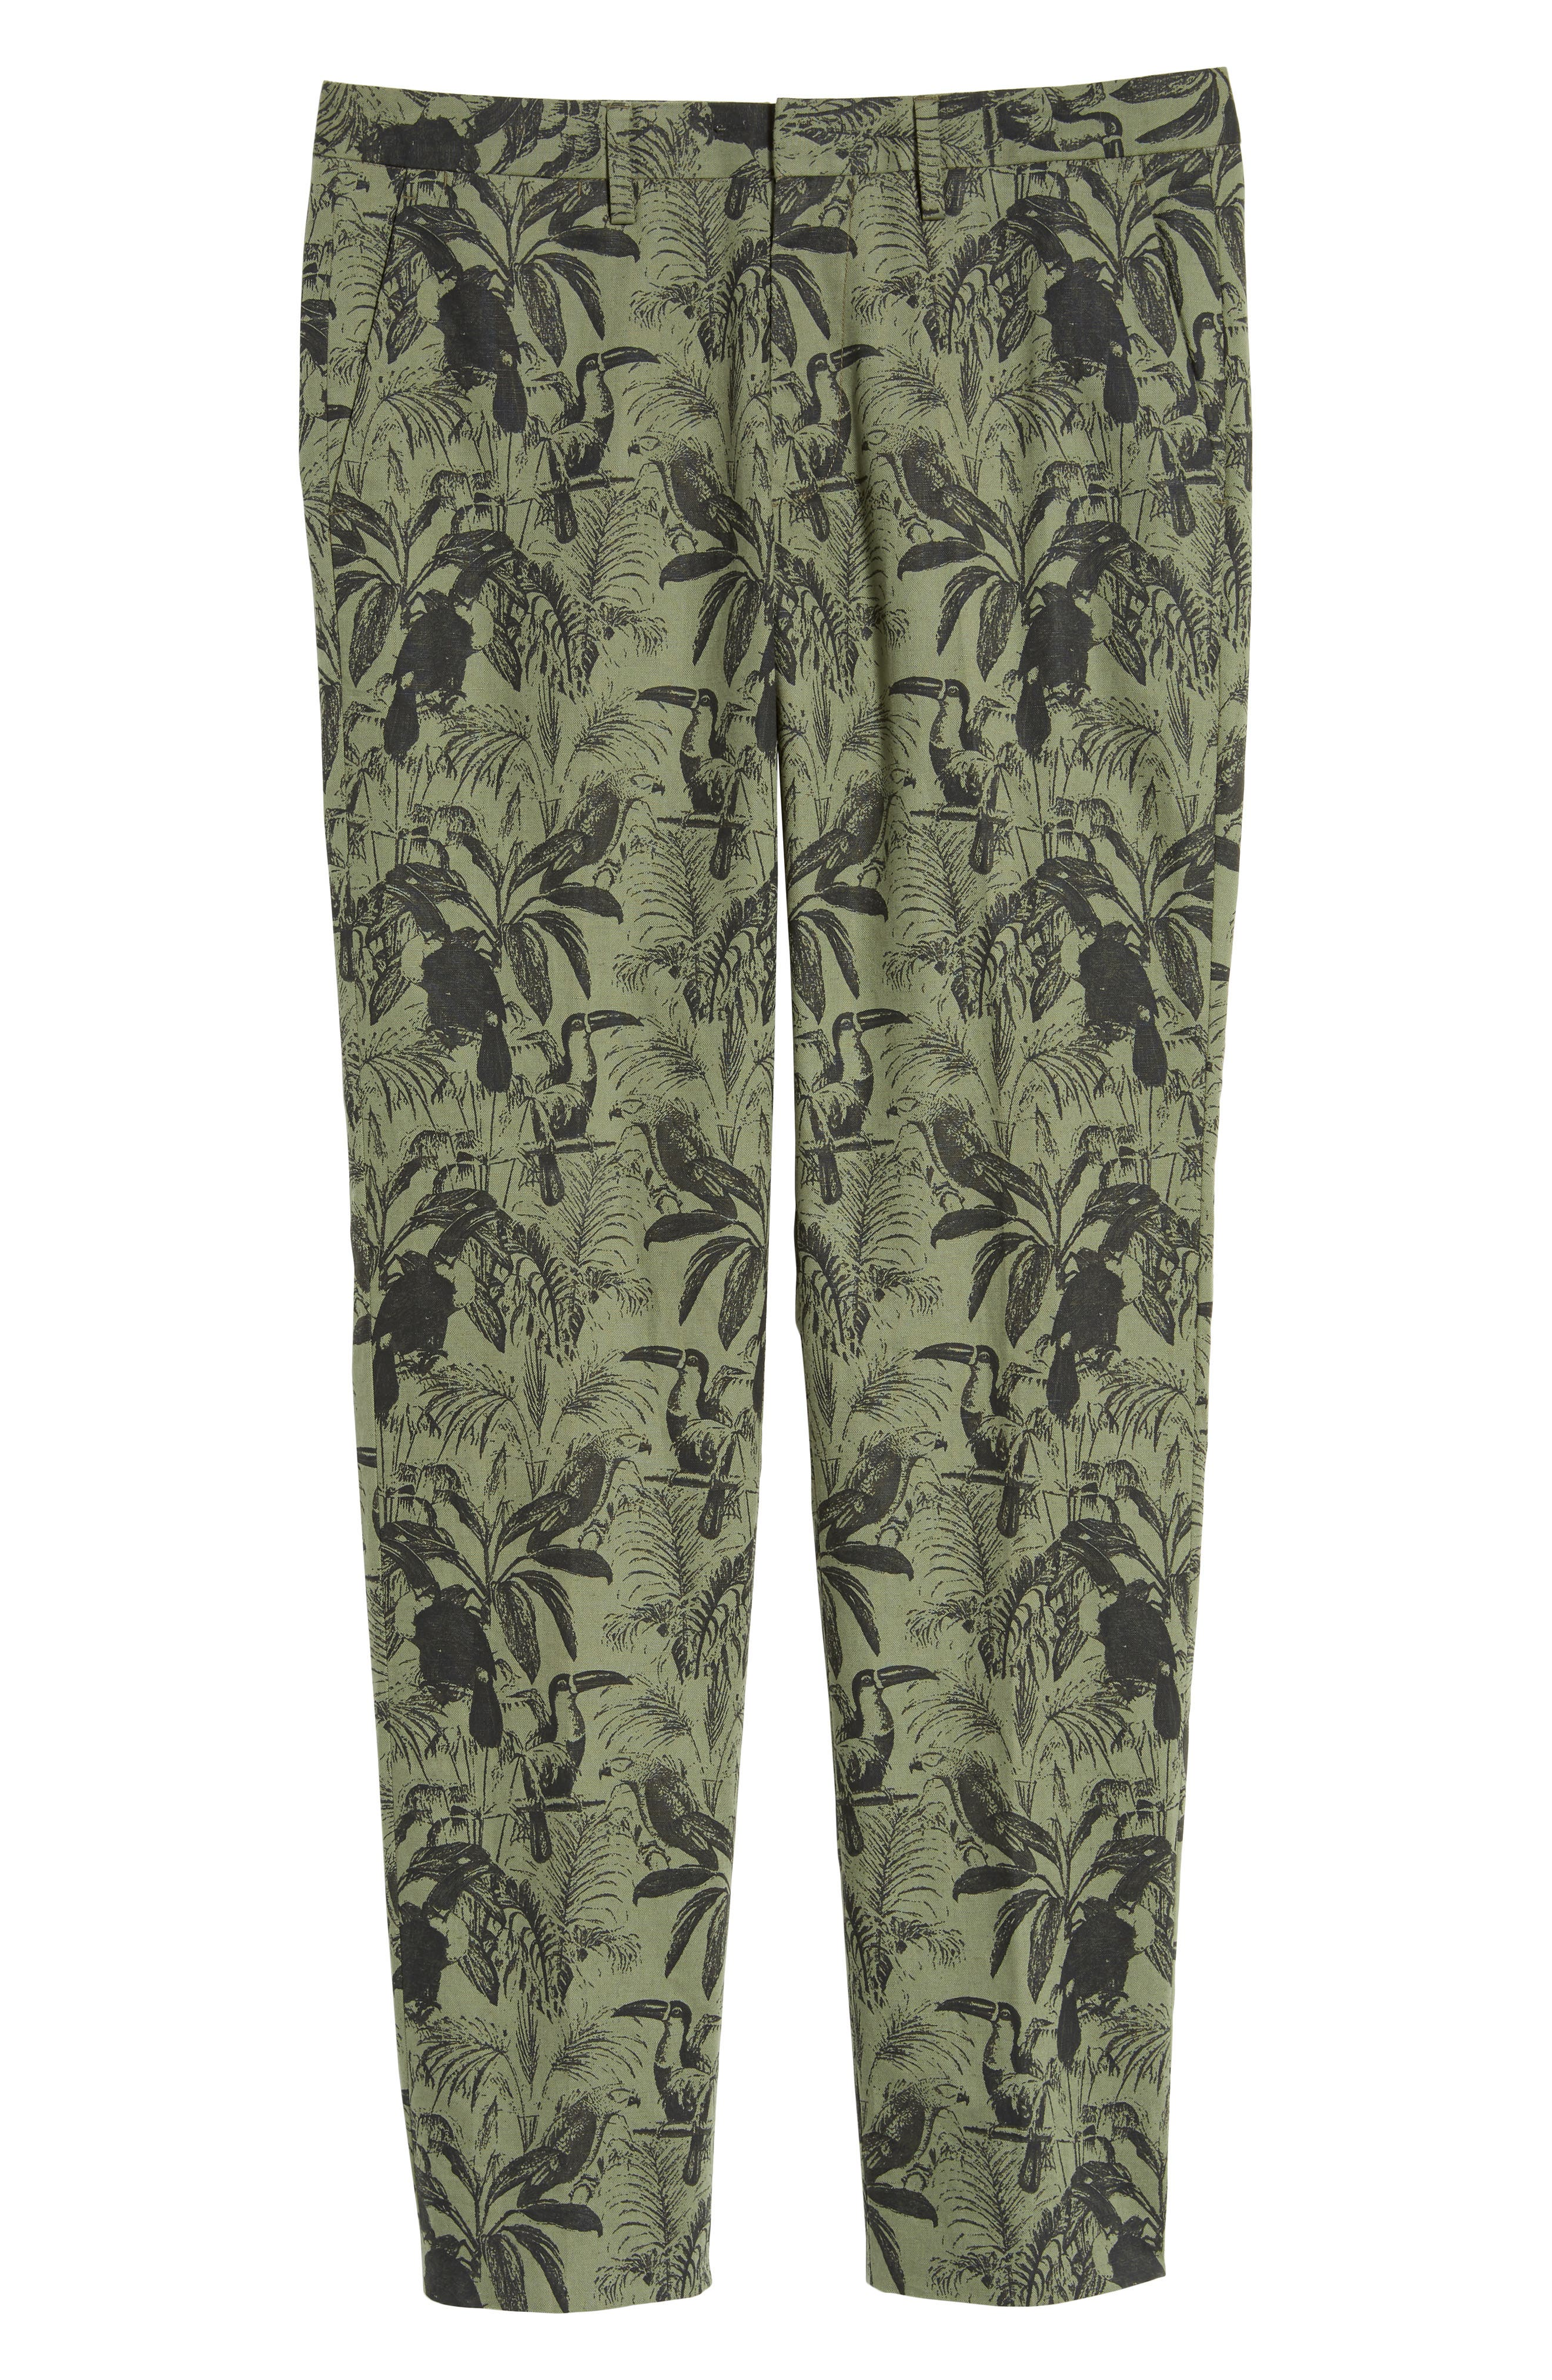 Foundation Print Slim Fit Trousers,                             Alternate thumbnail 6, color,                             300